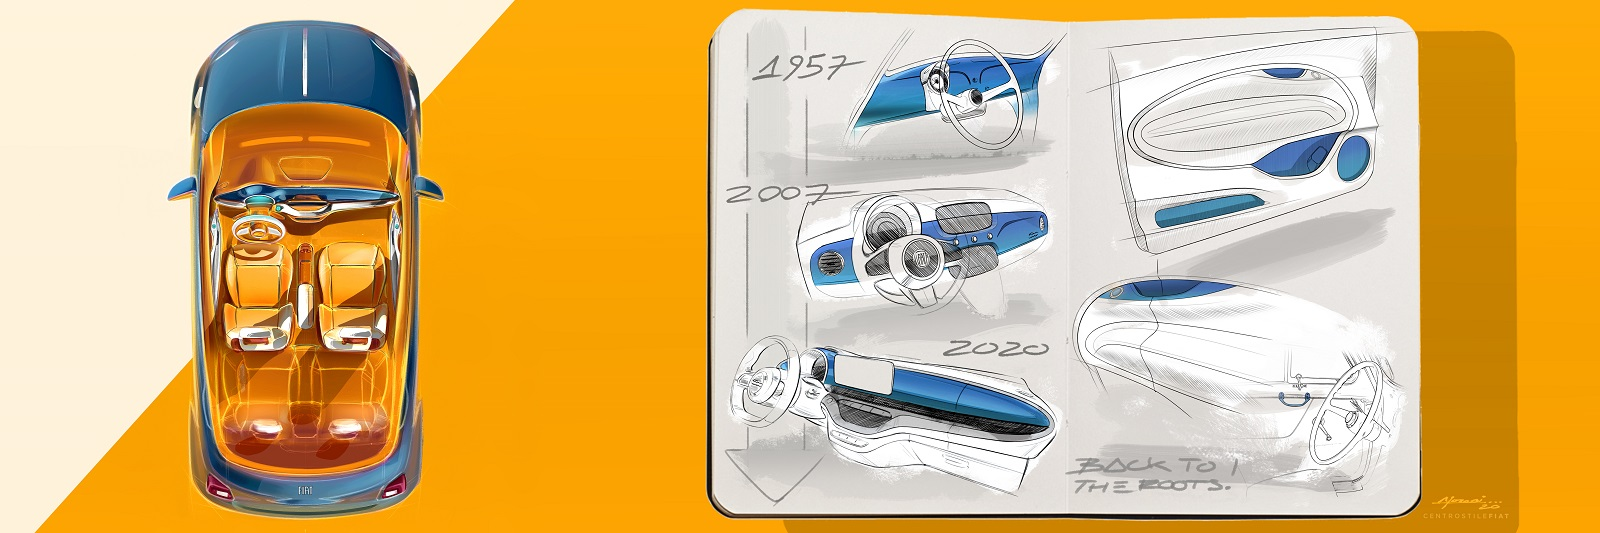 Fiat_500_electric